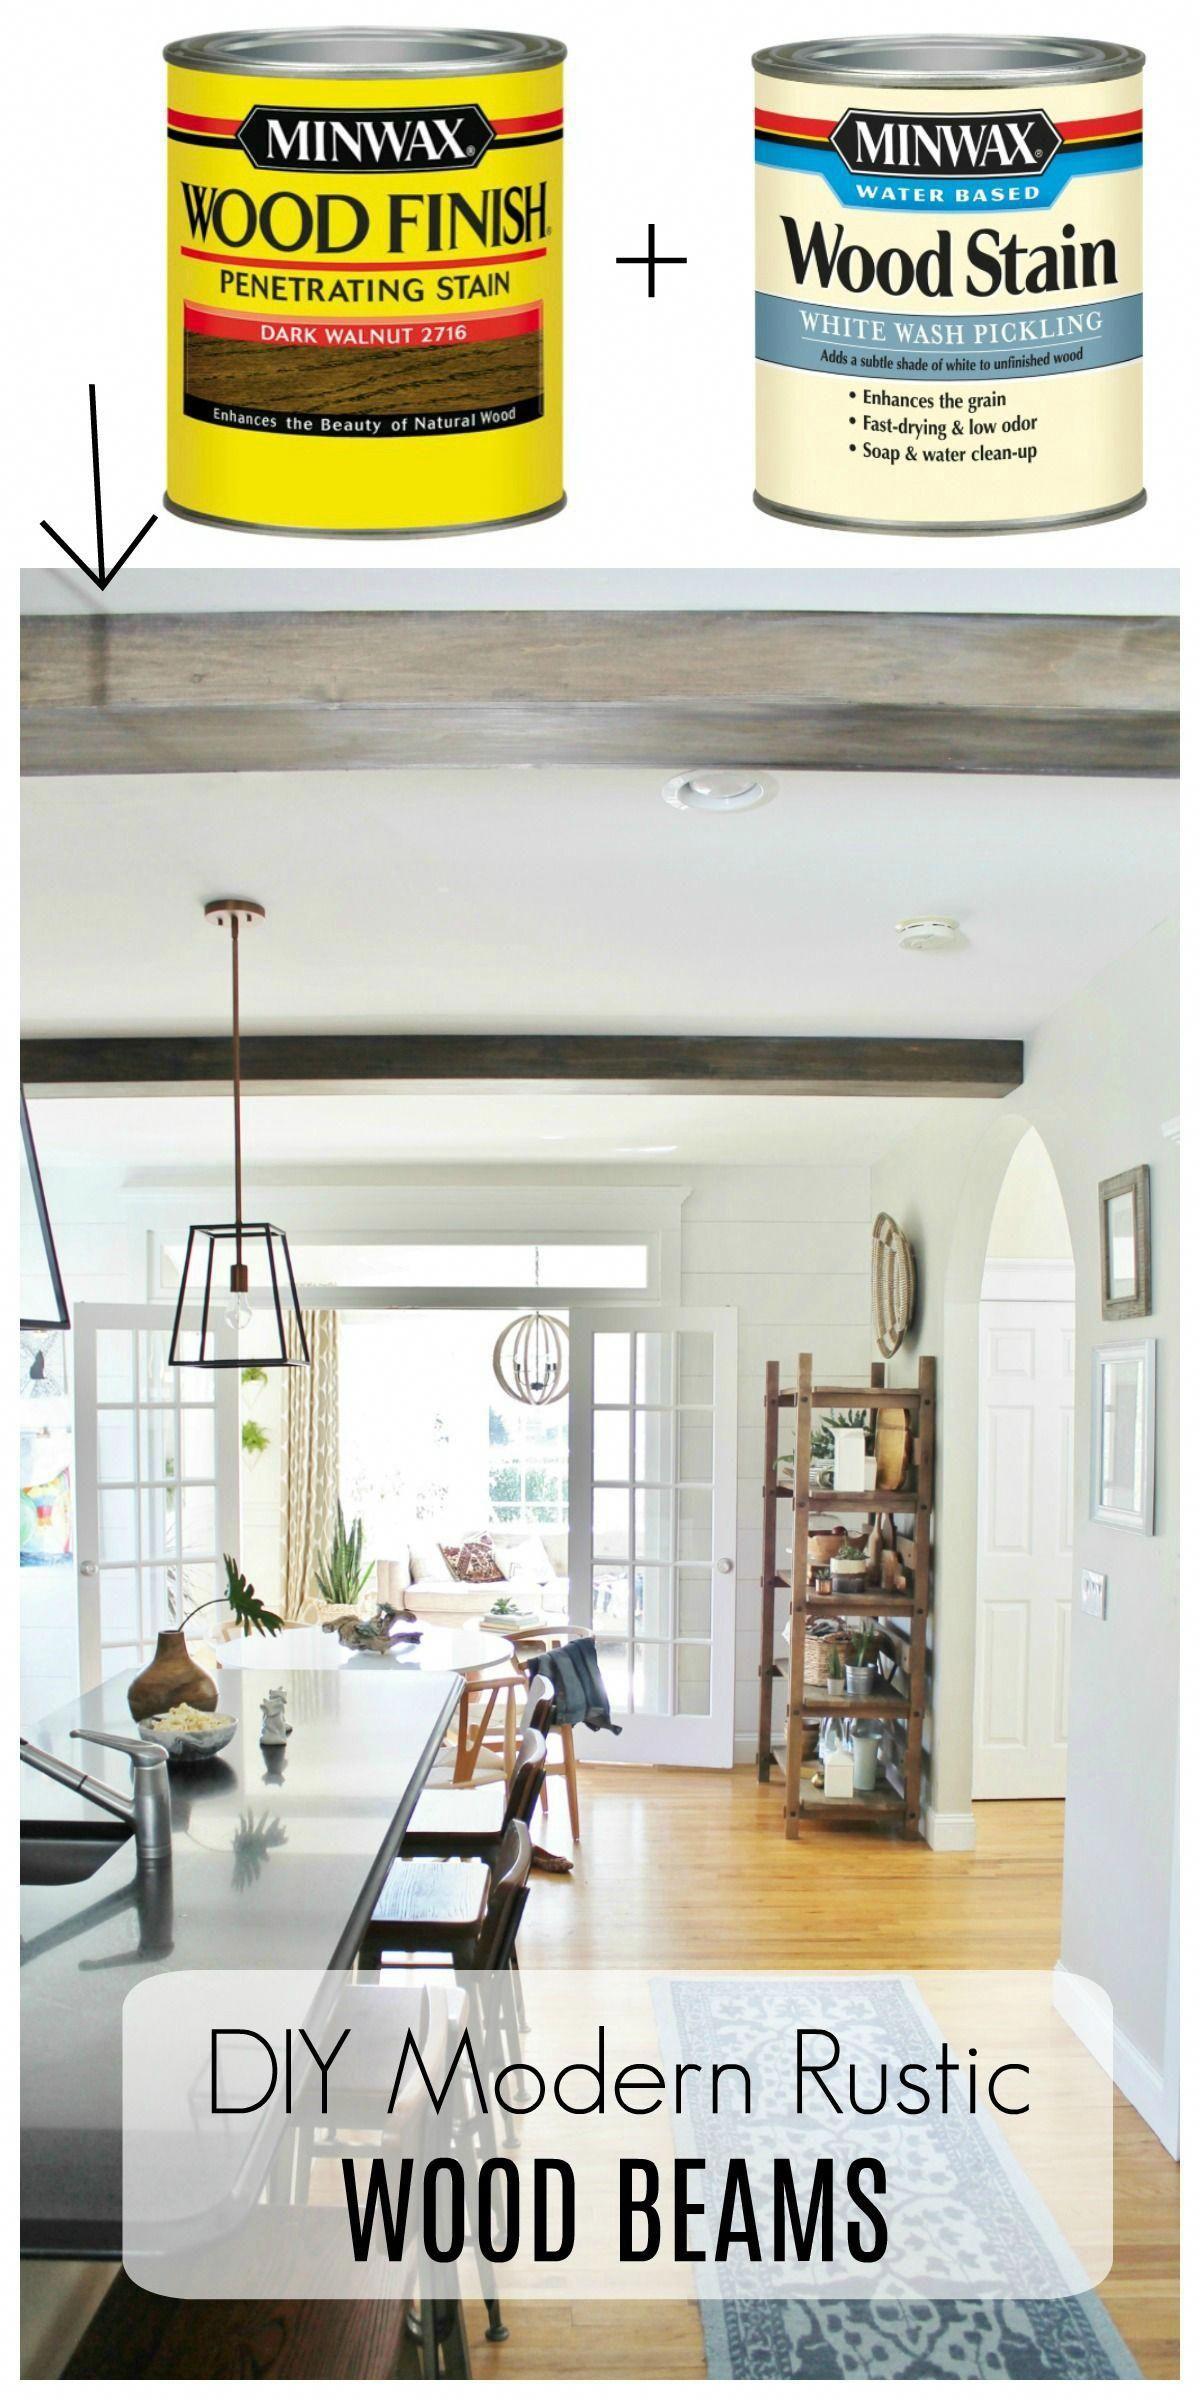 Diy modern rustic wood beams barnwood look by using minwax dark walnut white wash